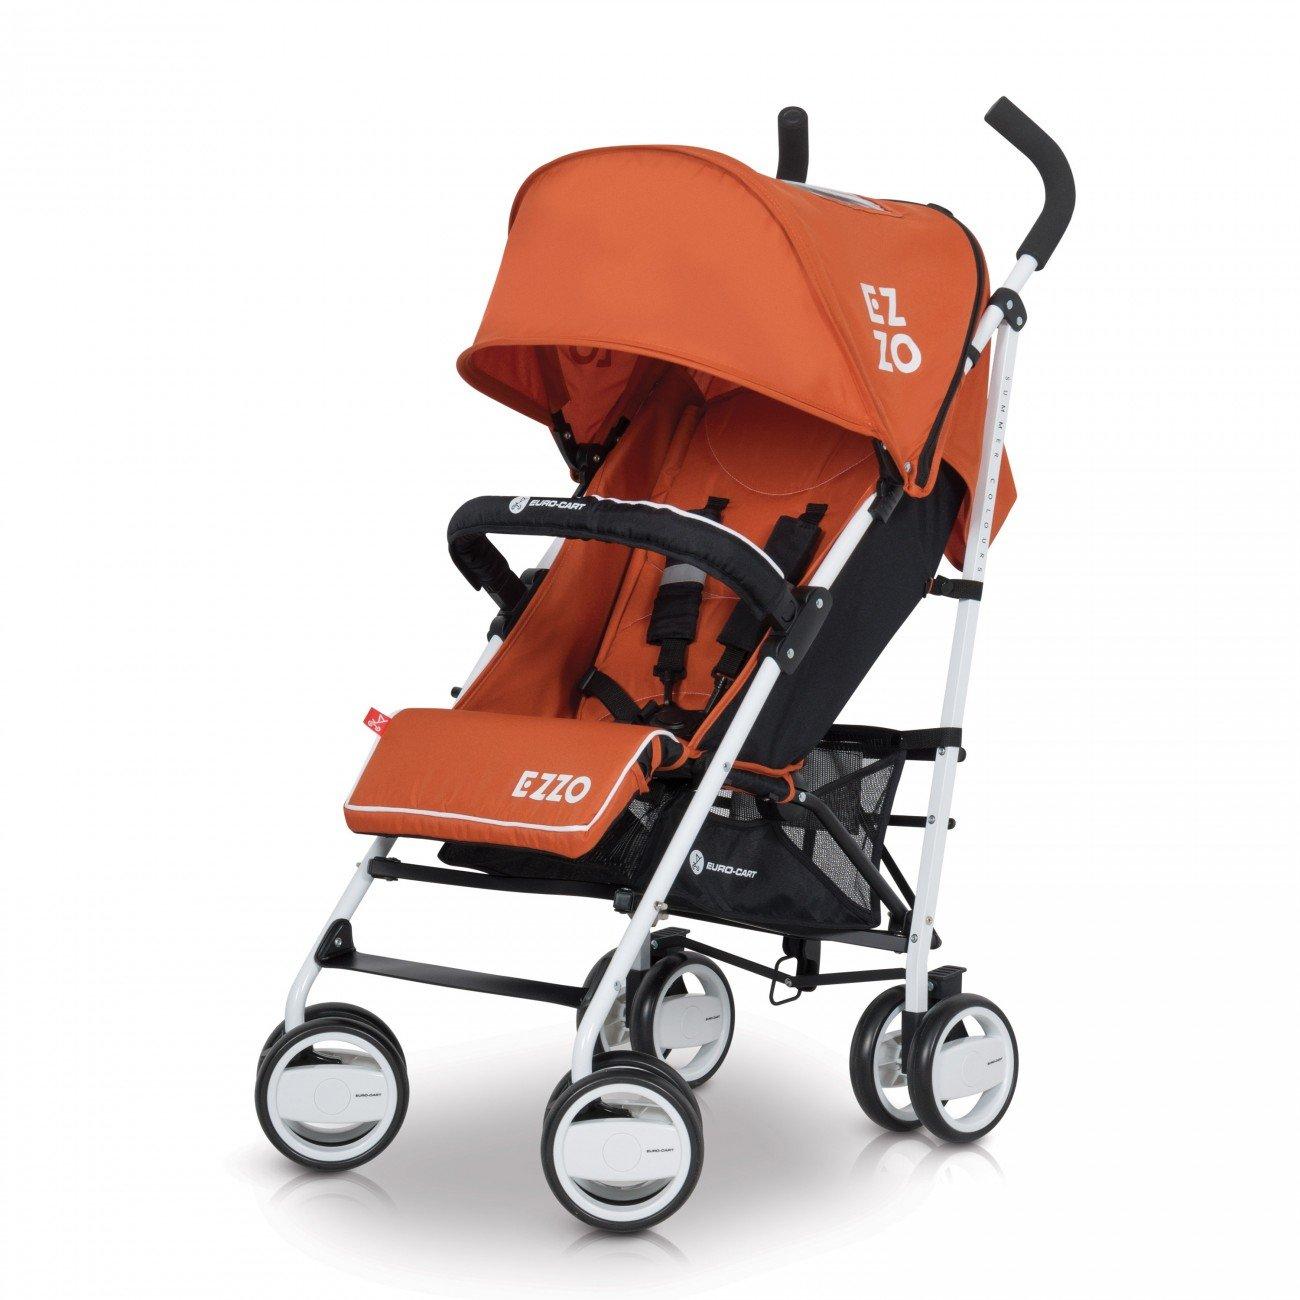 Baby Stroller Pram EZZO High Class Aluminium Pushchair - foldable, Colour Scarlet LCP Kids